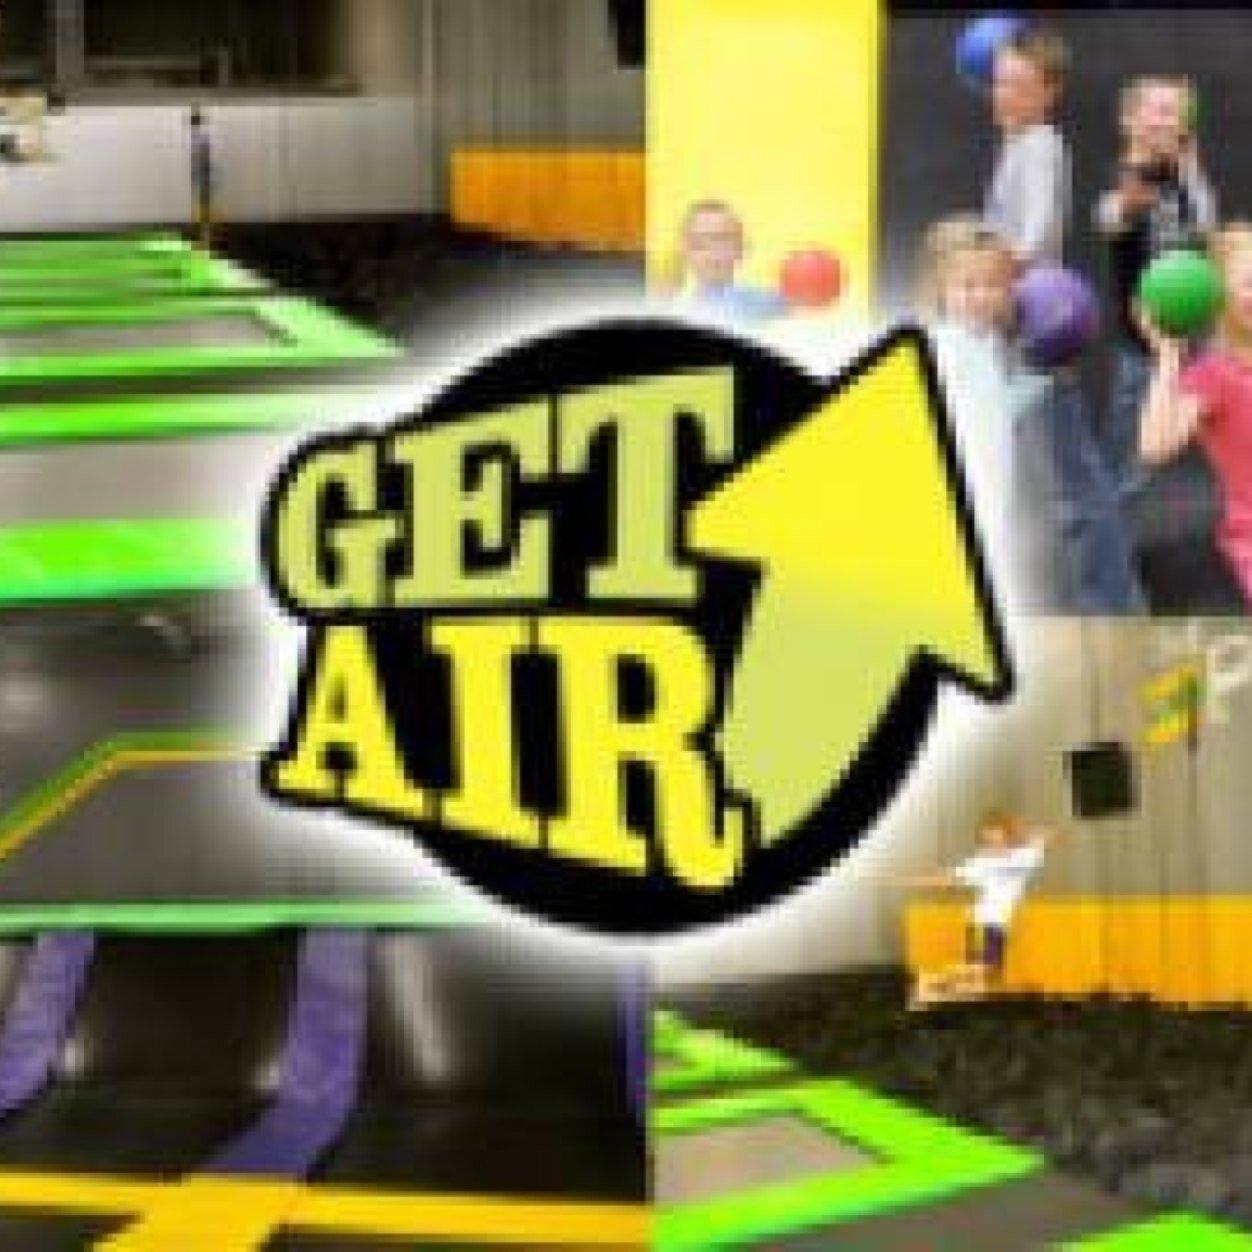 Get Air Poway (@GetAir_Poway)